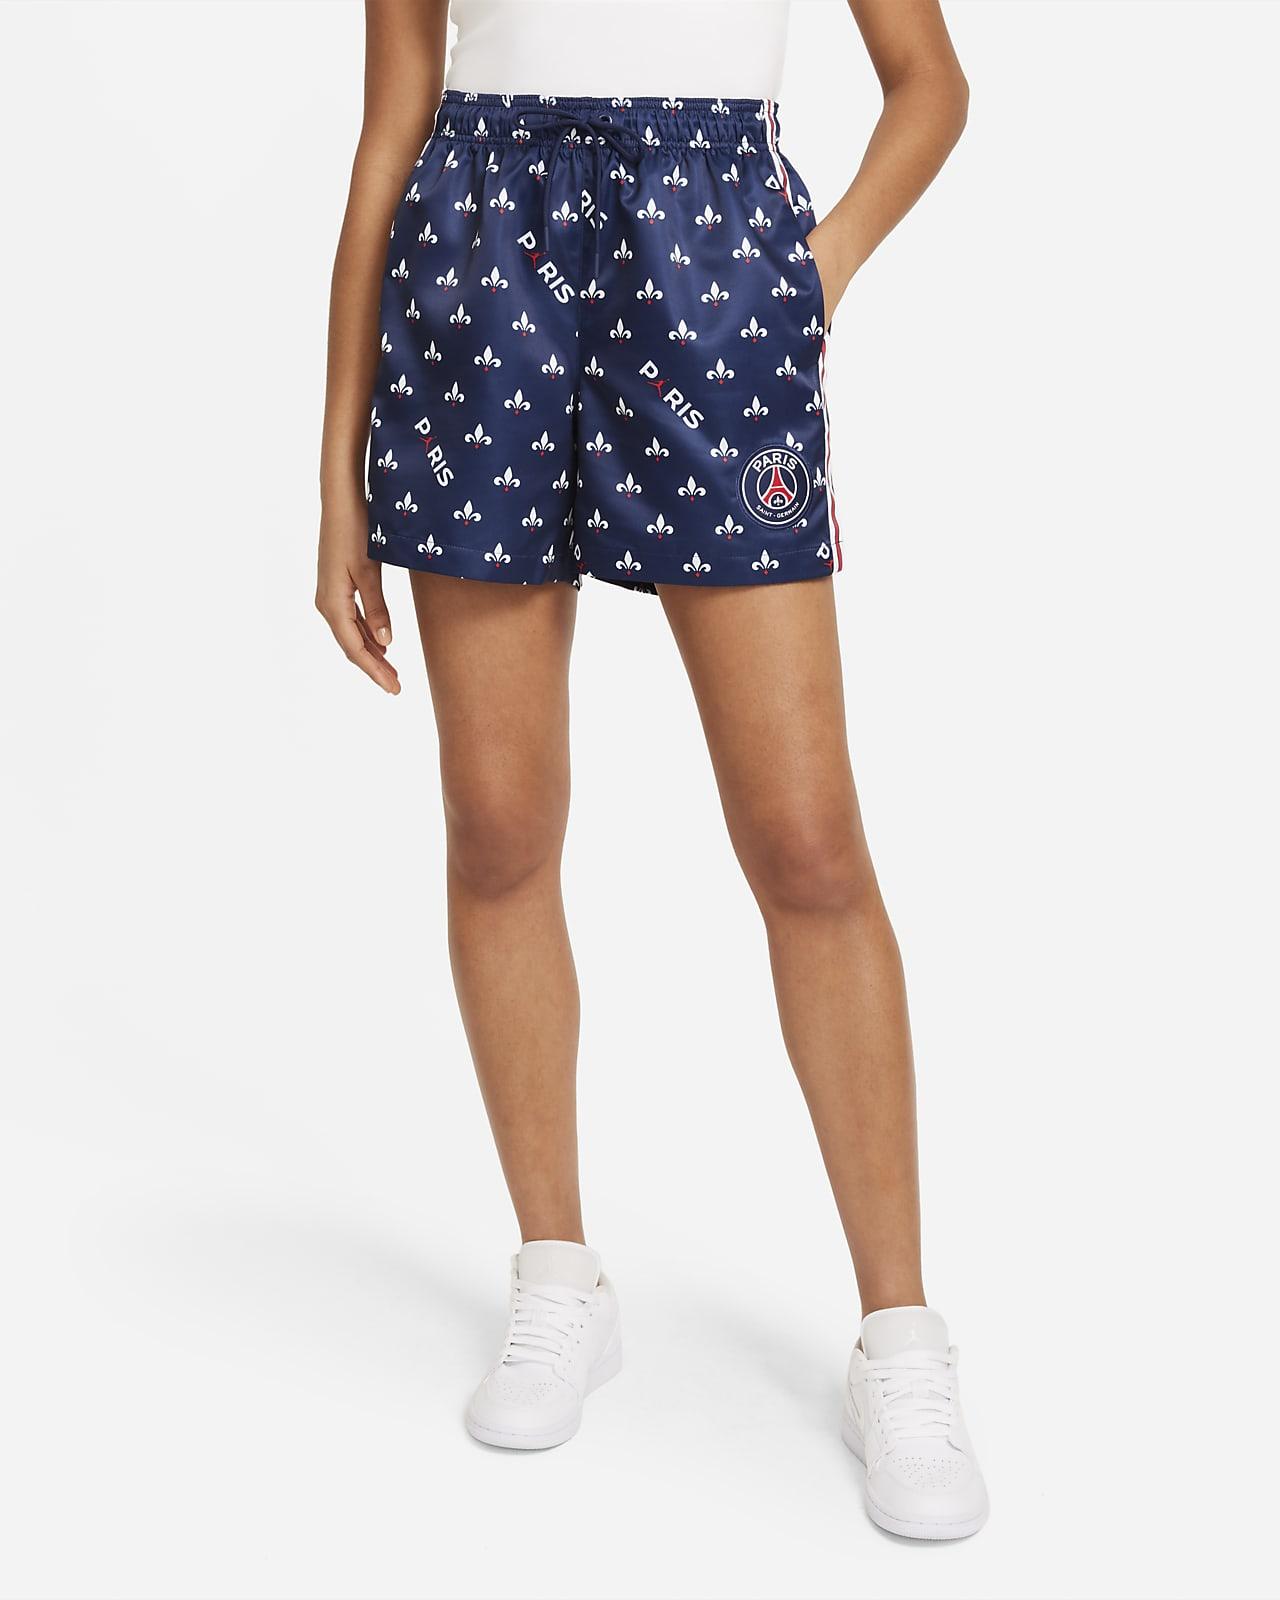 Shorts estampados para mujer del Paris Saint-Germain